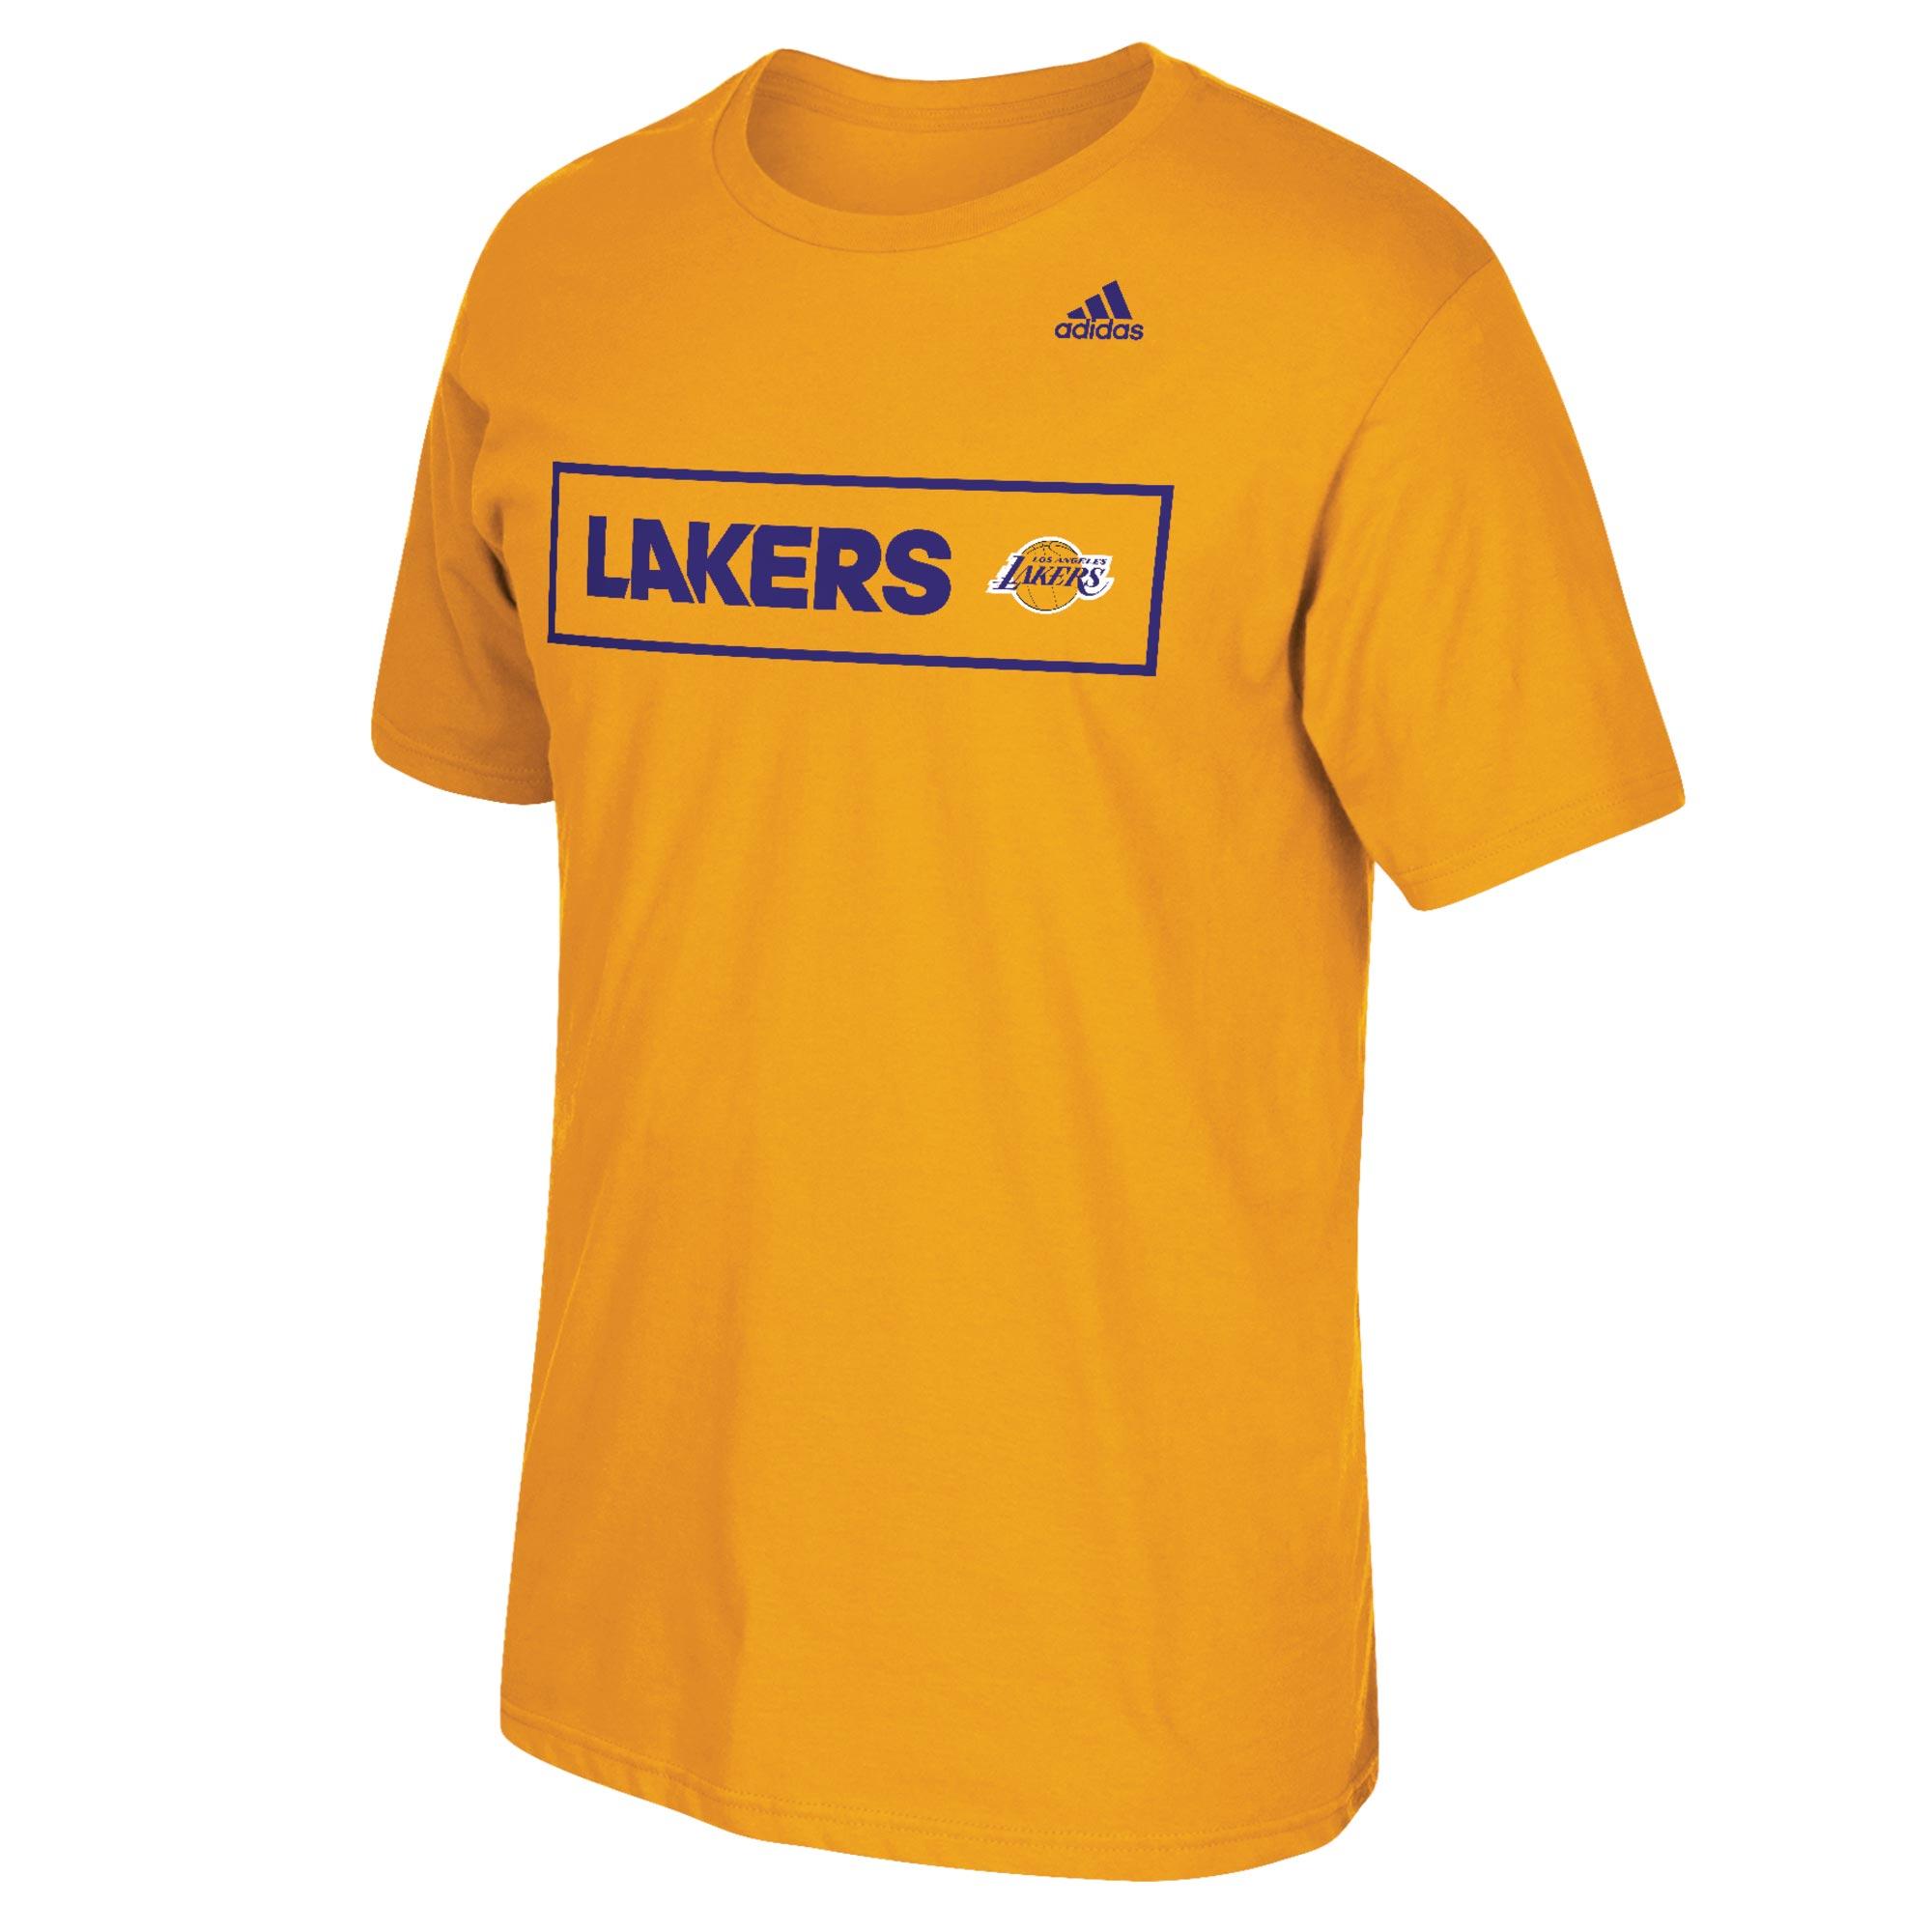 Los Angeles Lakers adidas Scoreboard T-Shirt - Mens